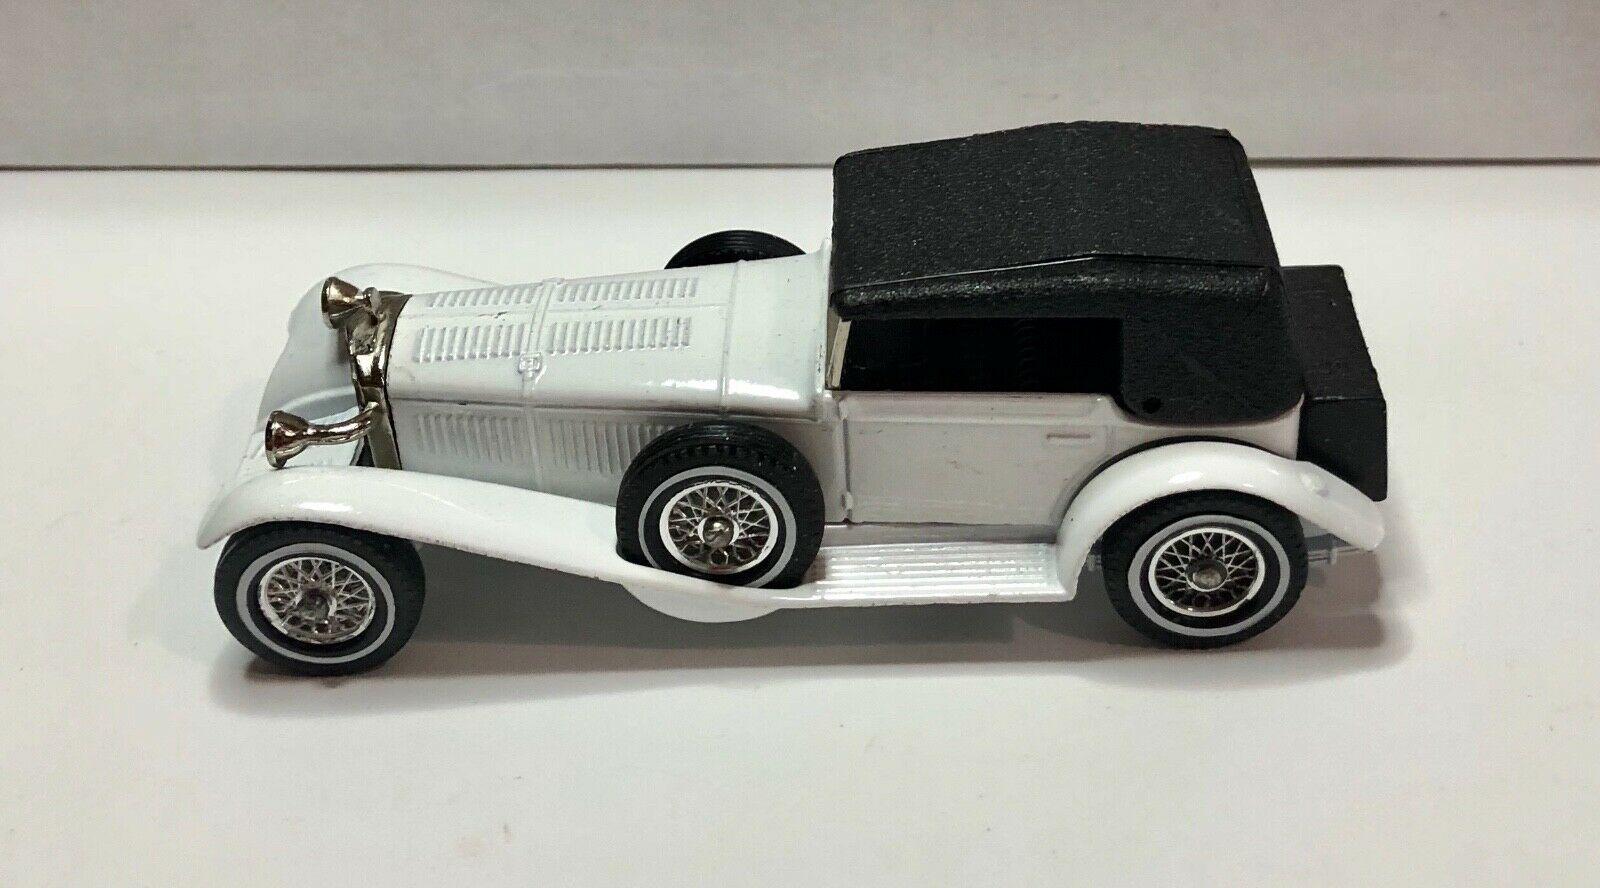 1928 Mercedes Benz 'SS' (Y-16)